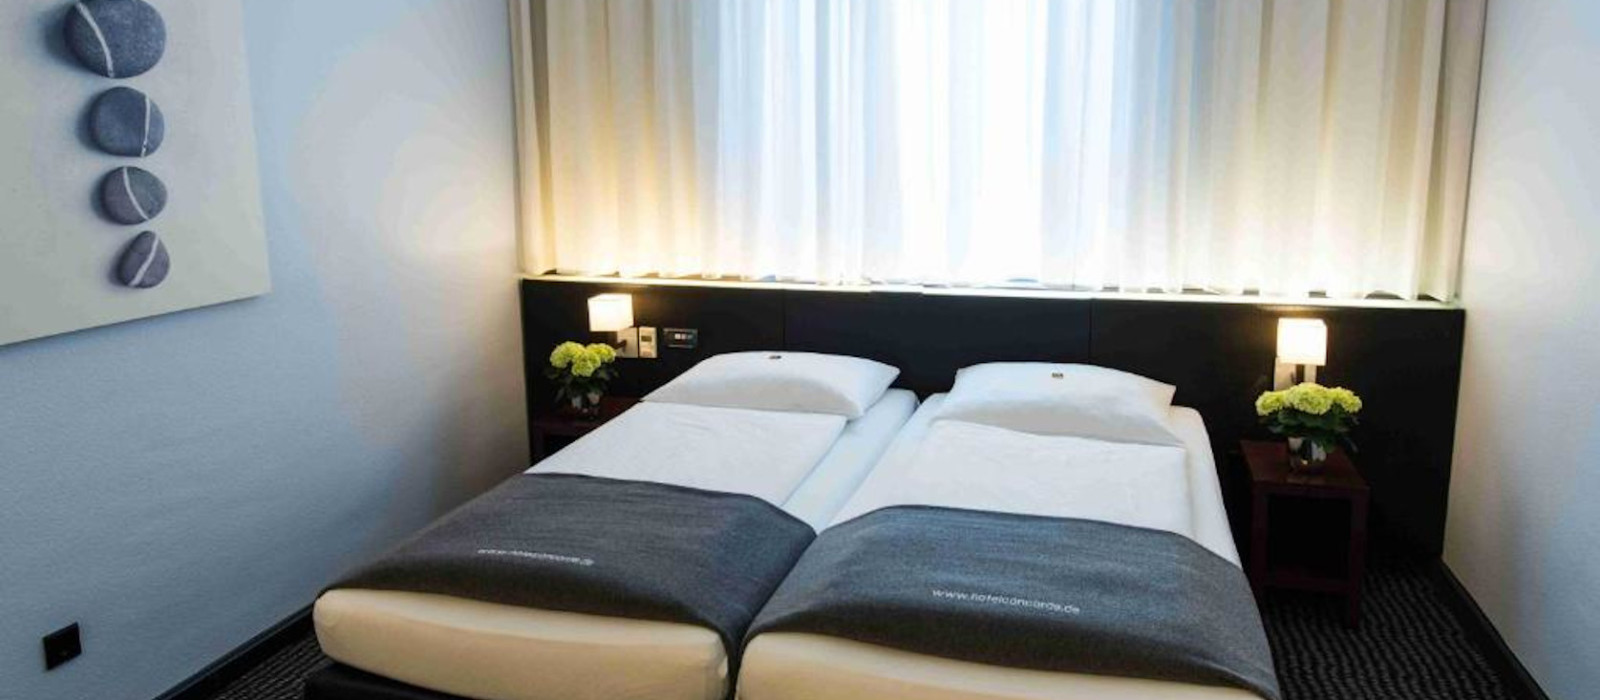 Hotel  Concorde Germany